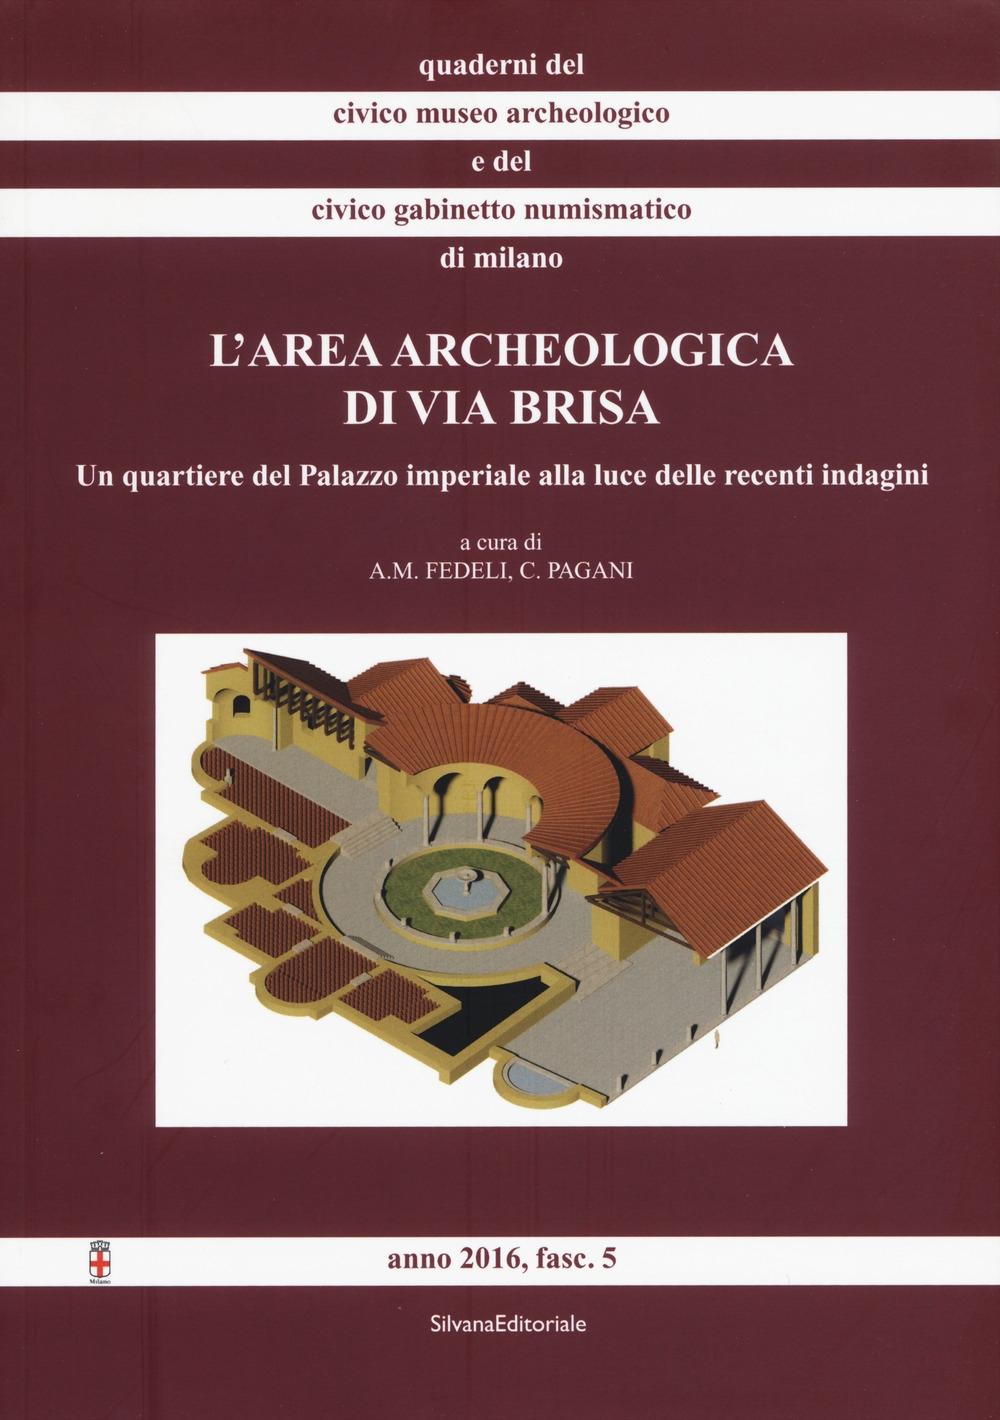 L'area archeologica di via Brisa